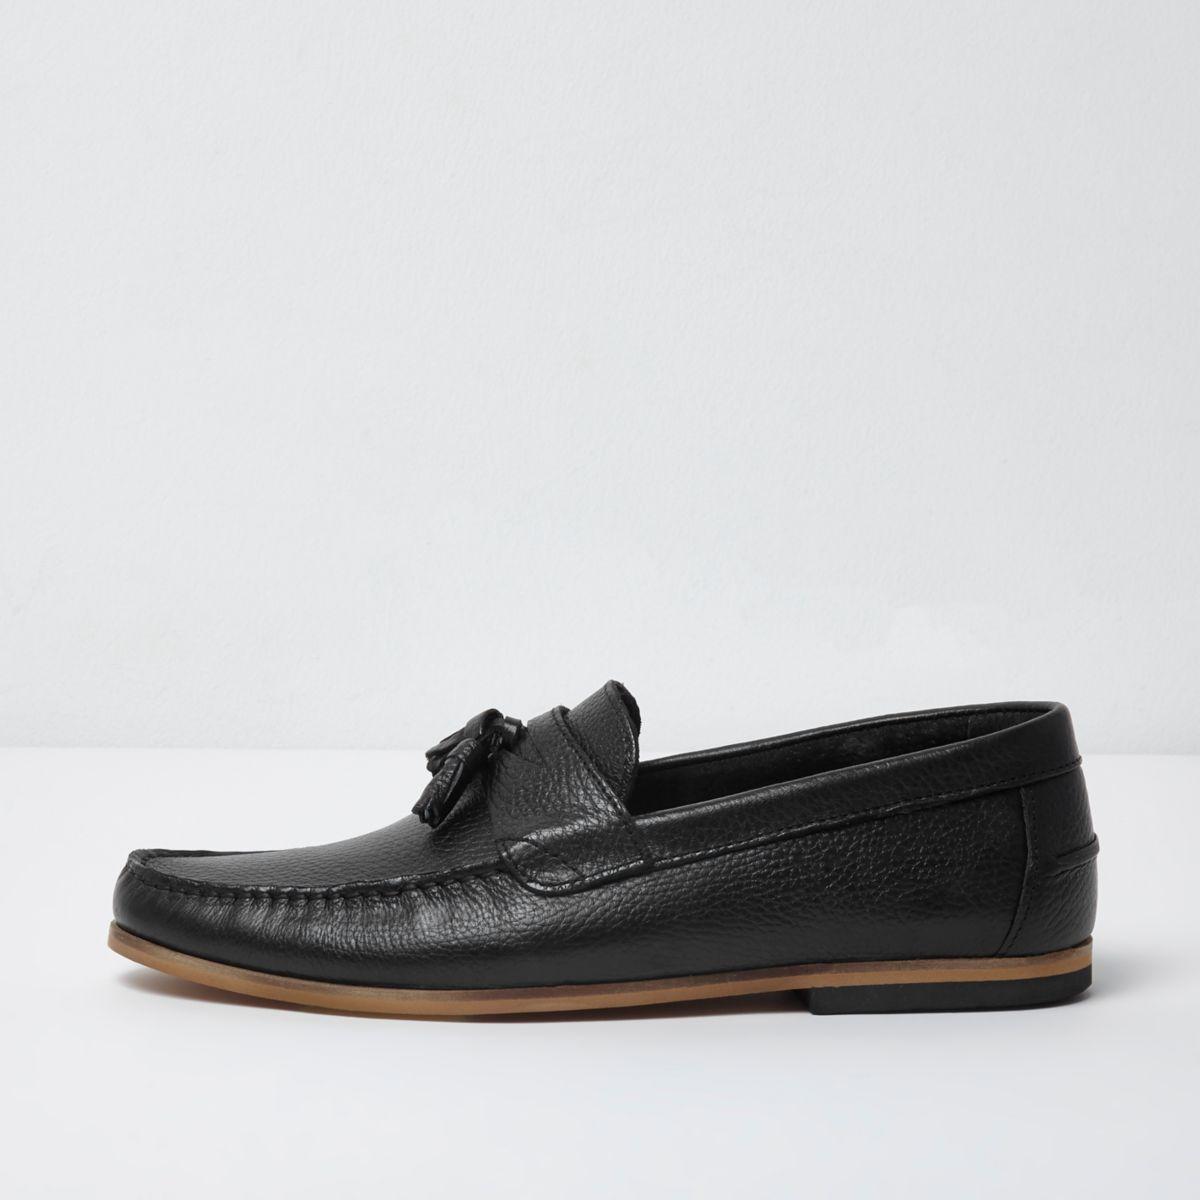 Black tumbled leather tassel loafers